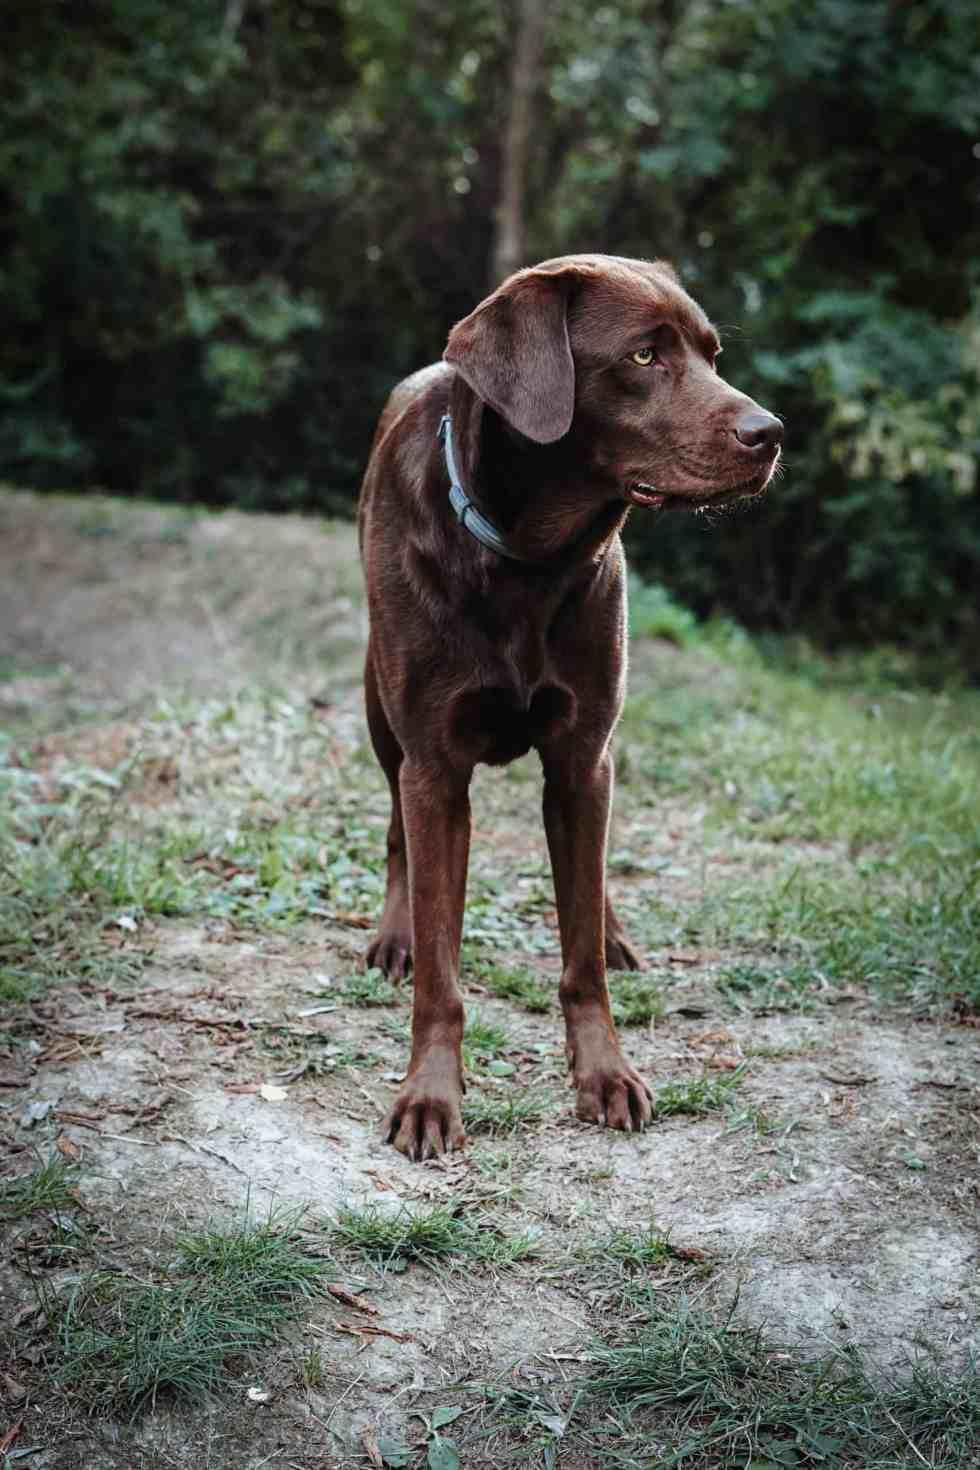 hundepfeife-konditionieren-labrador-rueckruf-stopp-tipps-anleitung